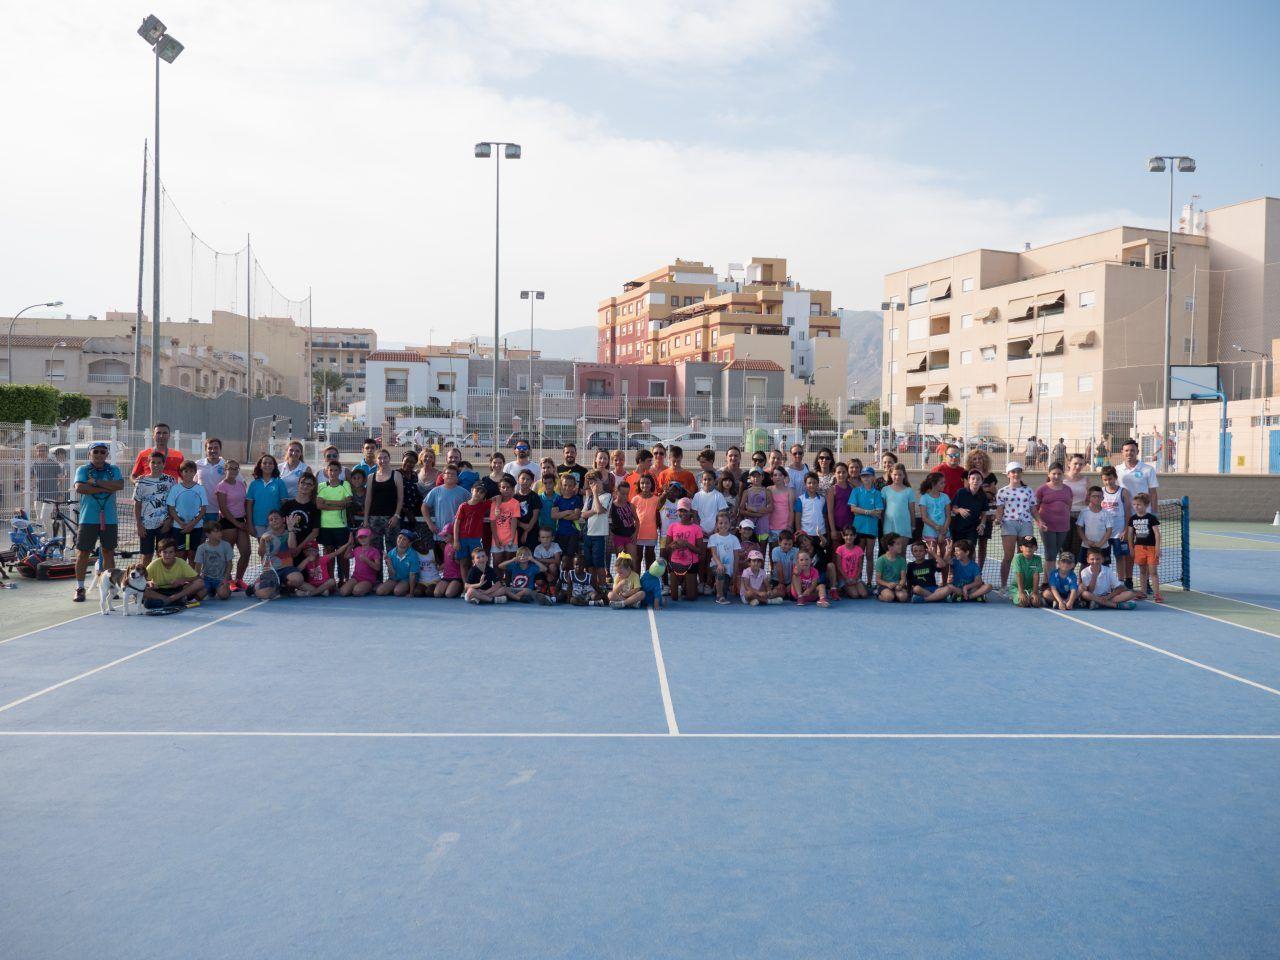 Club de Tenis Aguadulce/Escuela